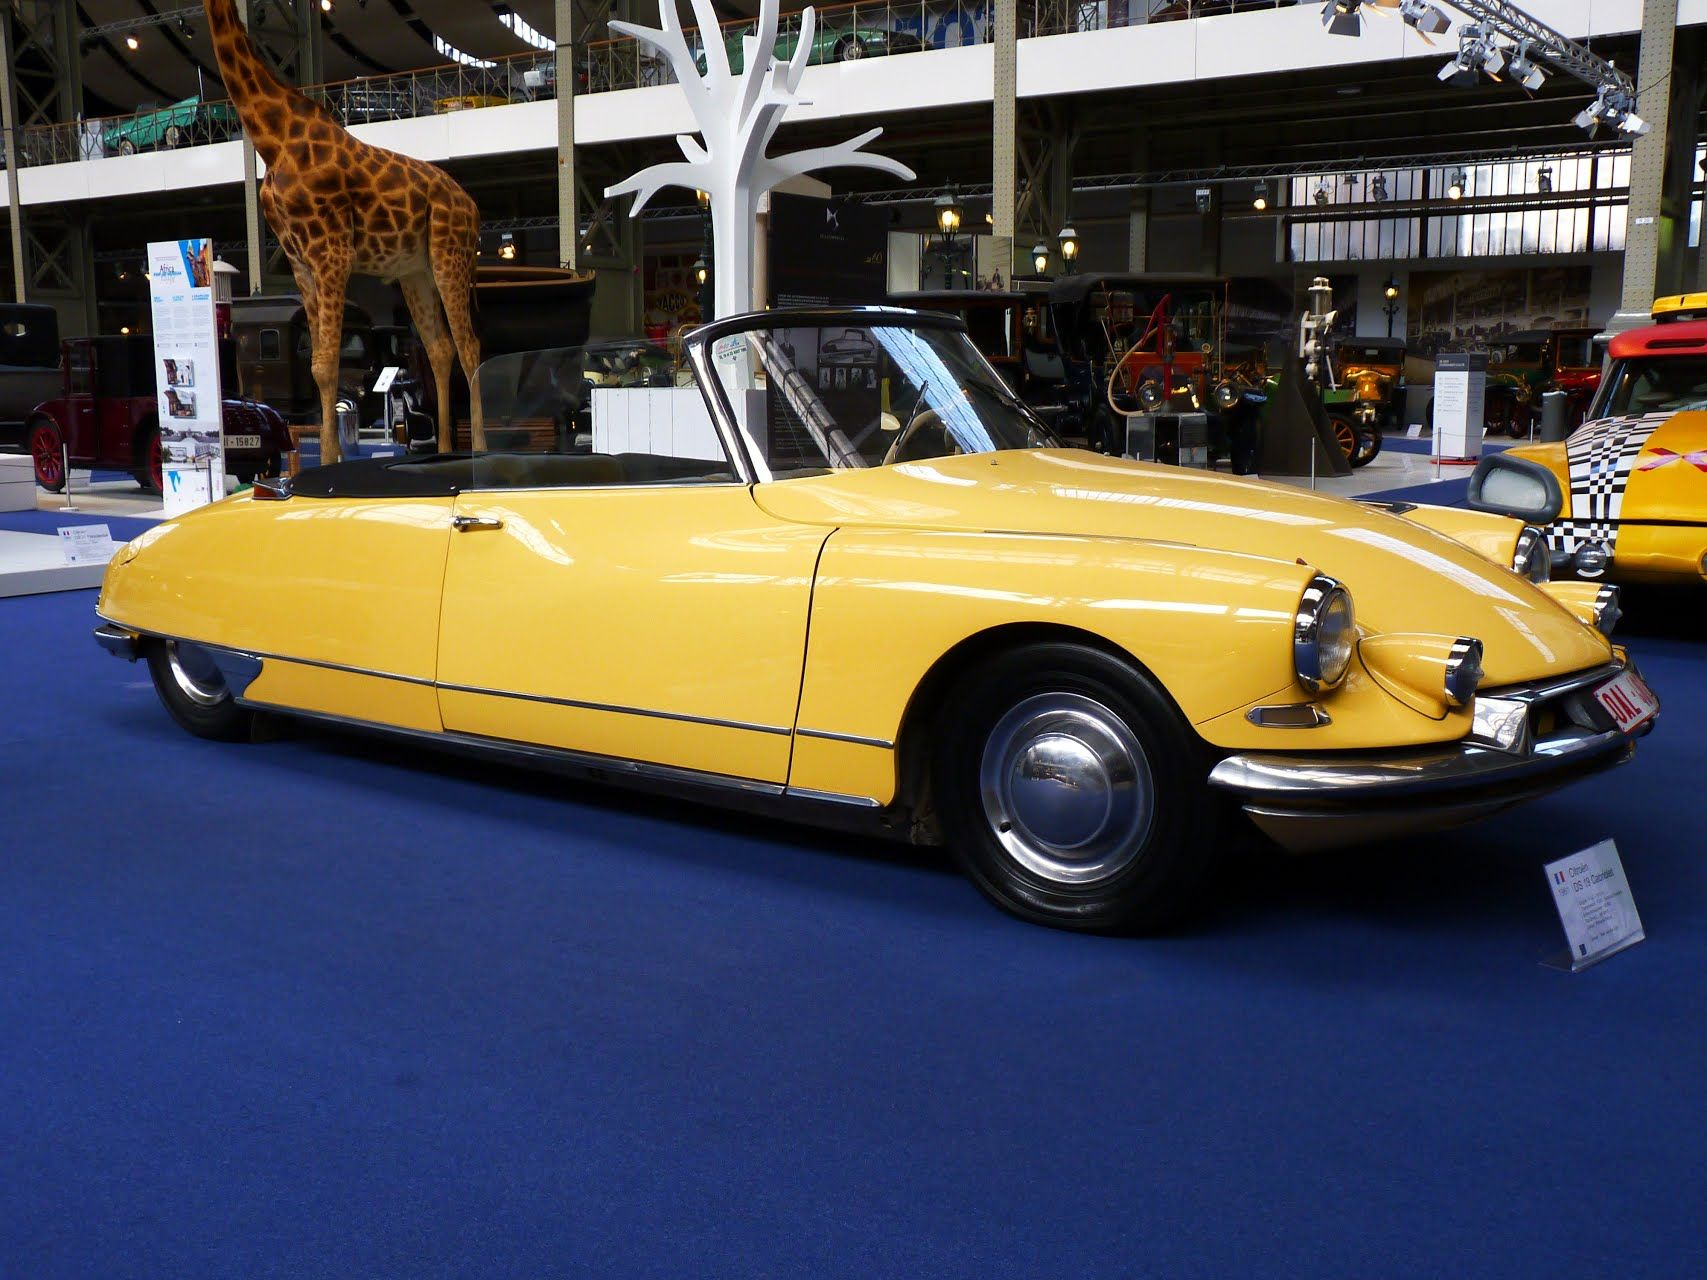 citro n ds 19 cabriolet 1961 on the road pinterest ds citroen ds and cars. Black Bedroom Furniture Sets. Home Design Ideas